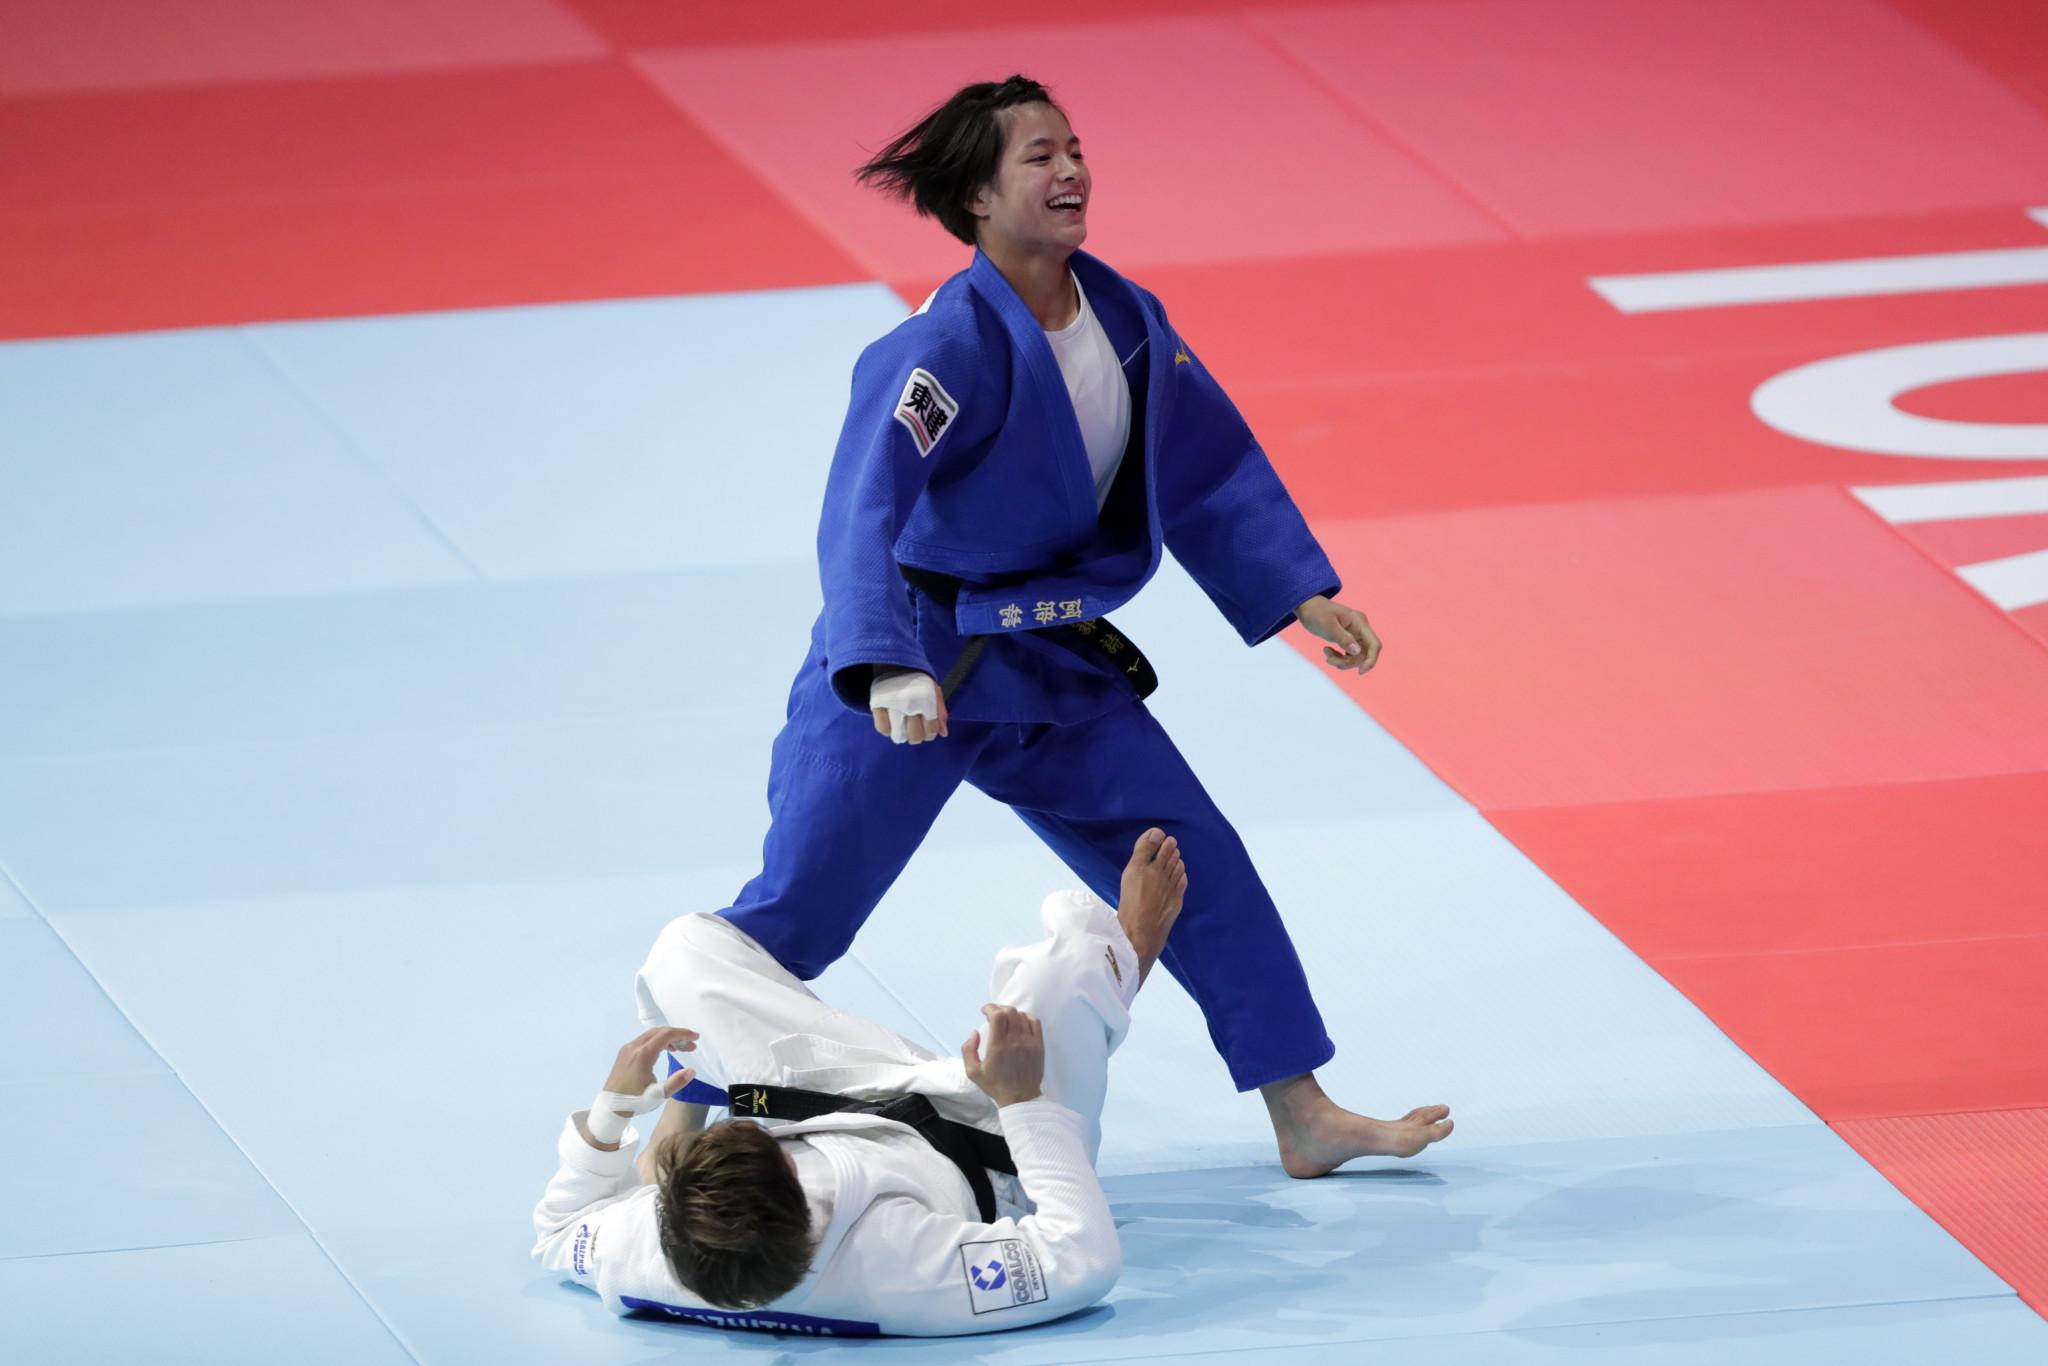 Mixed night for Abe family at IJF World Championships as Uta wins gold but Hifumi falls short